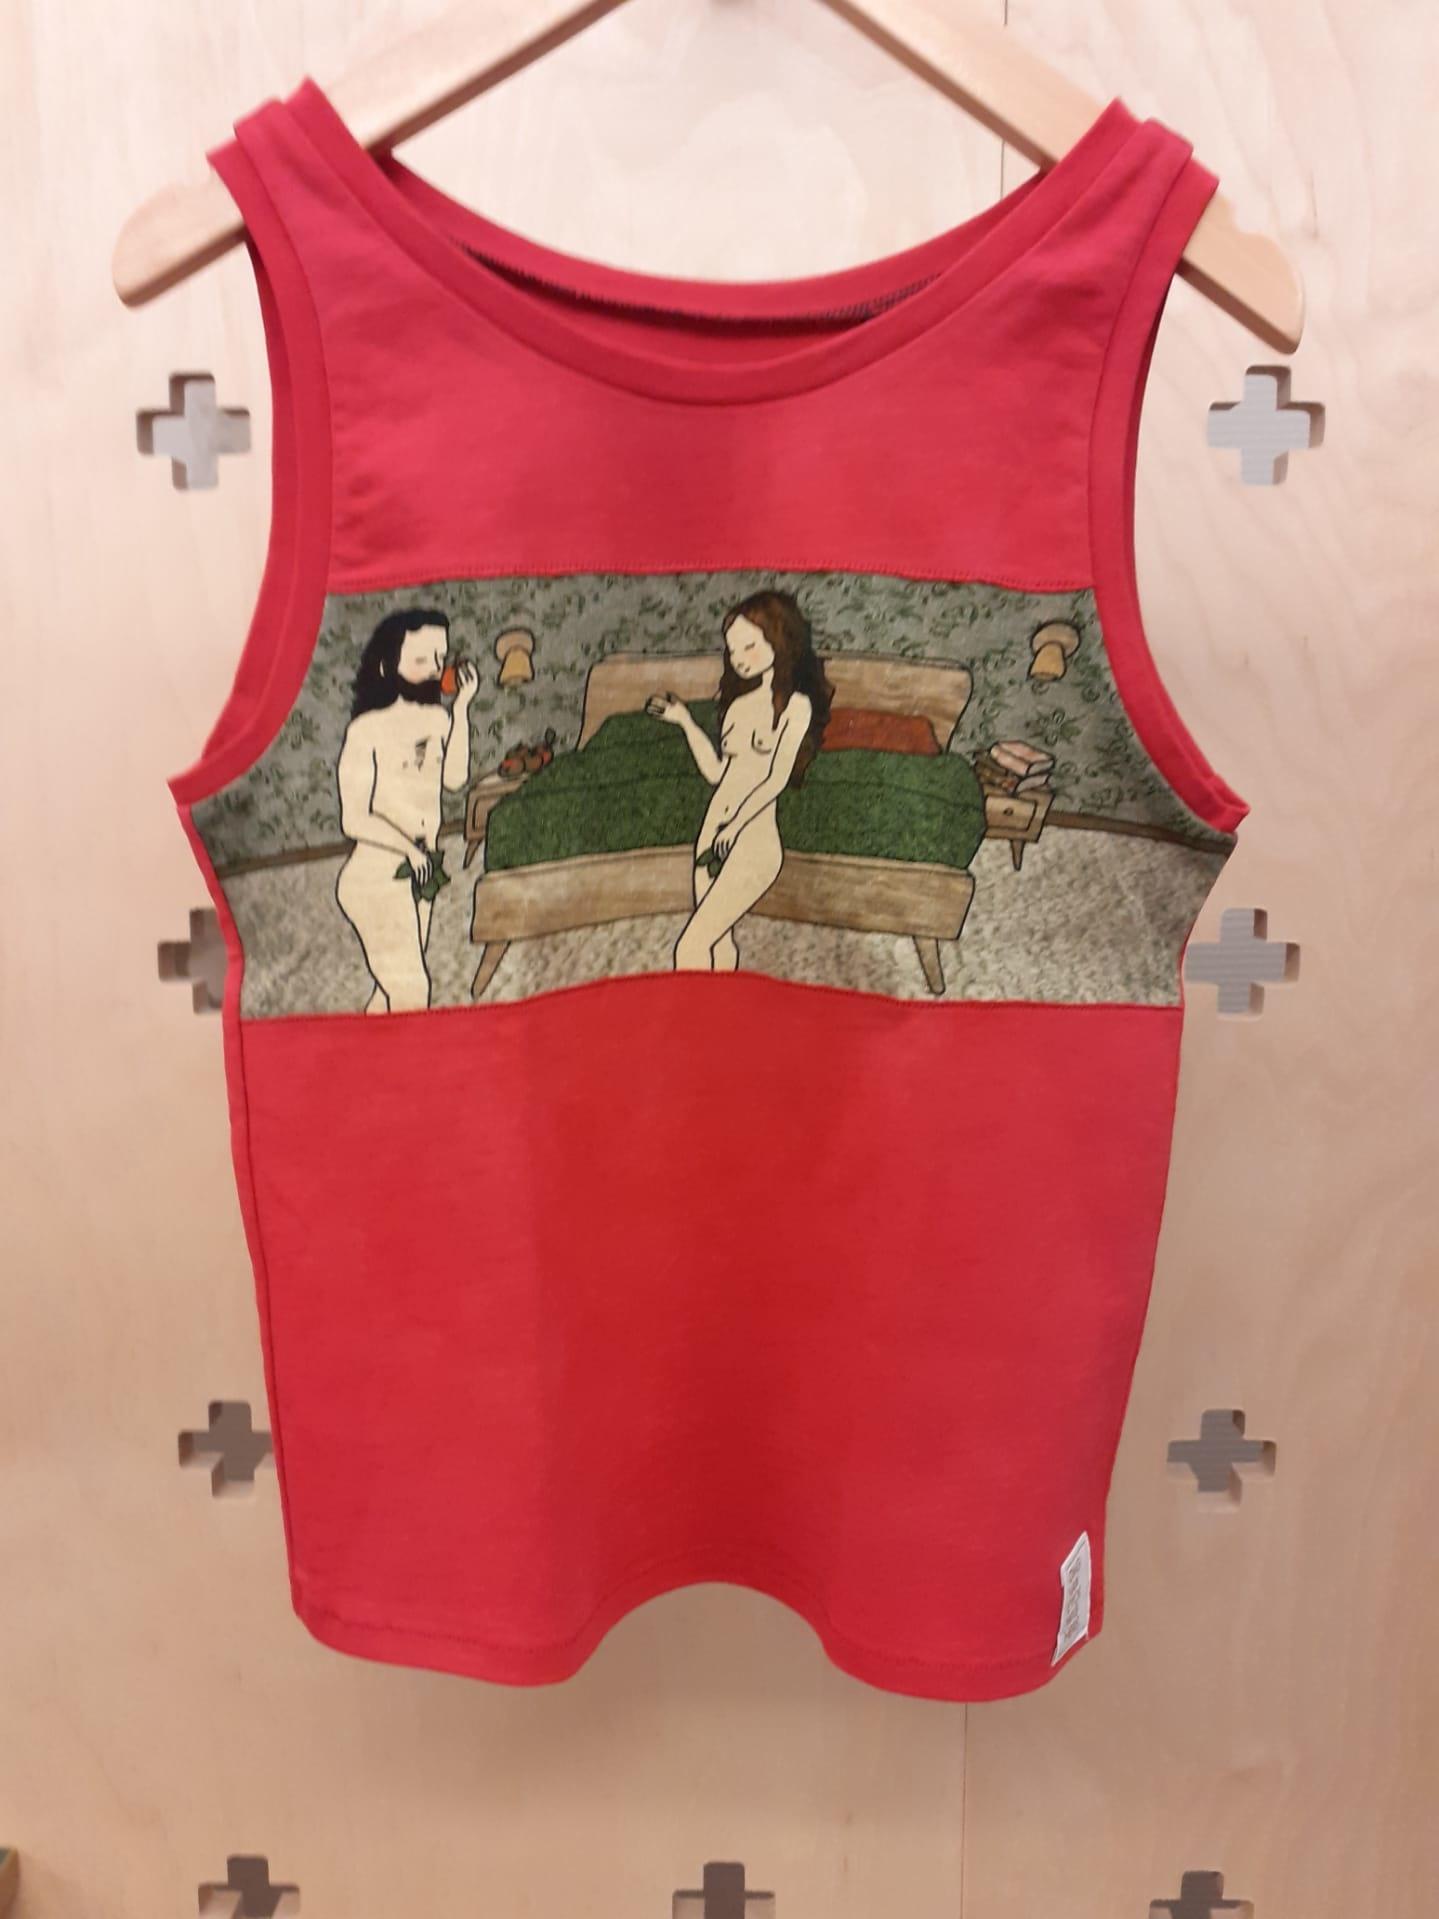 Tine De Groote Unique children's top shirt with motifs of the Ghent Altarpiece - Tine De Groote